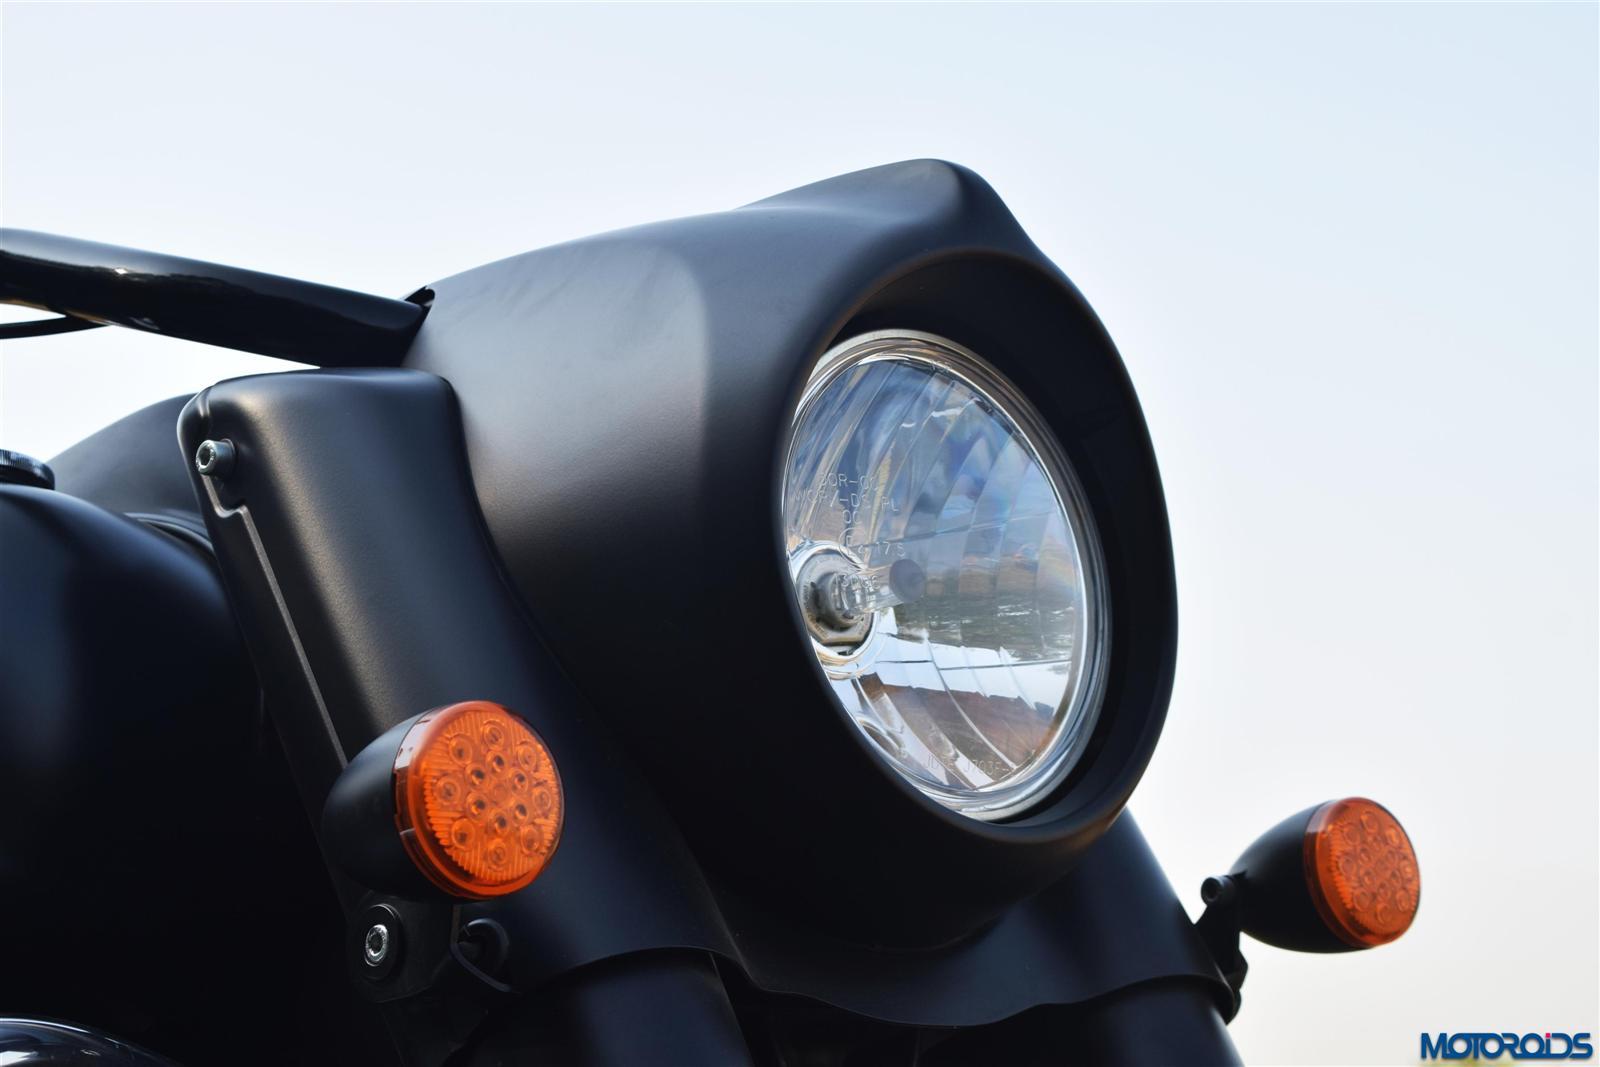 Indian Dark Horse headlight